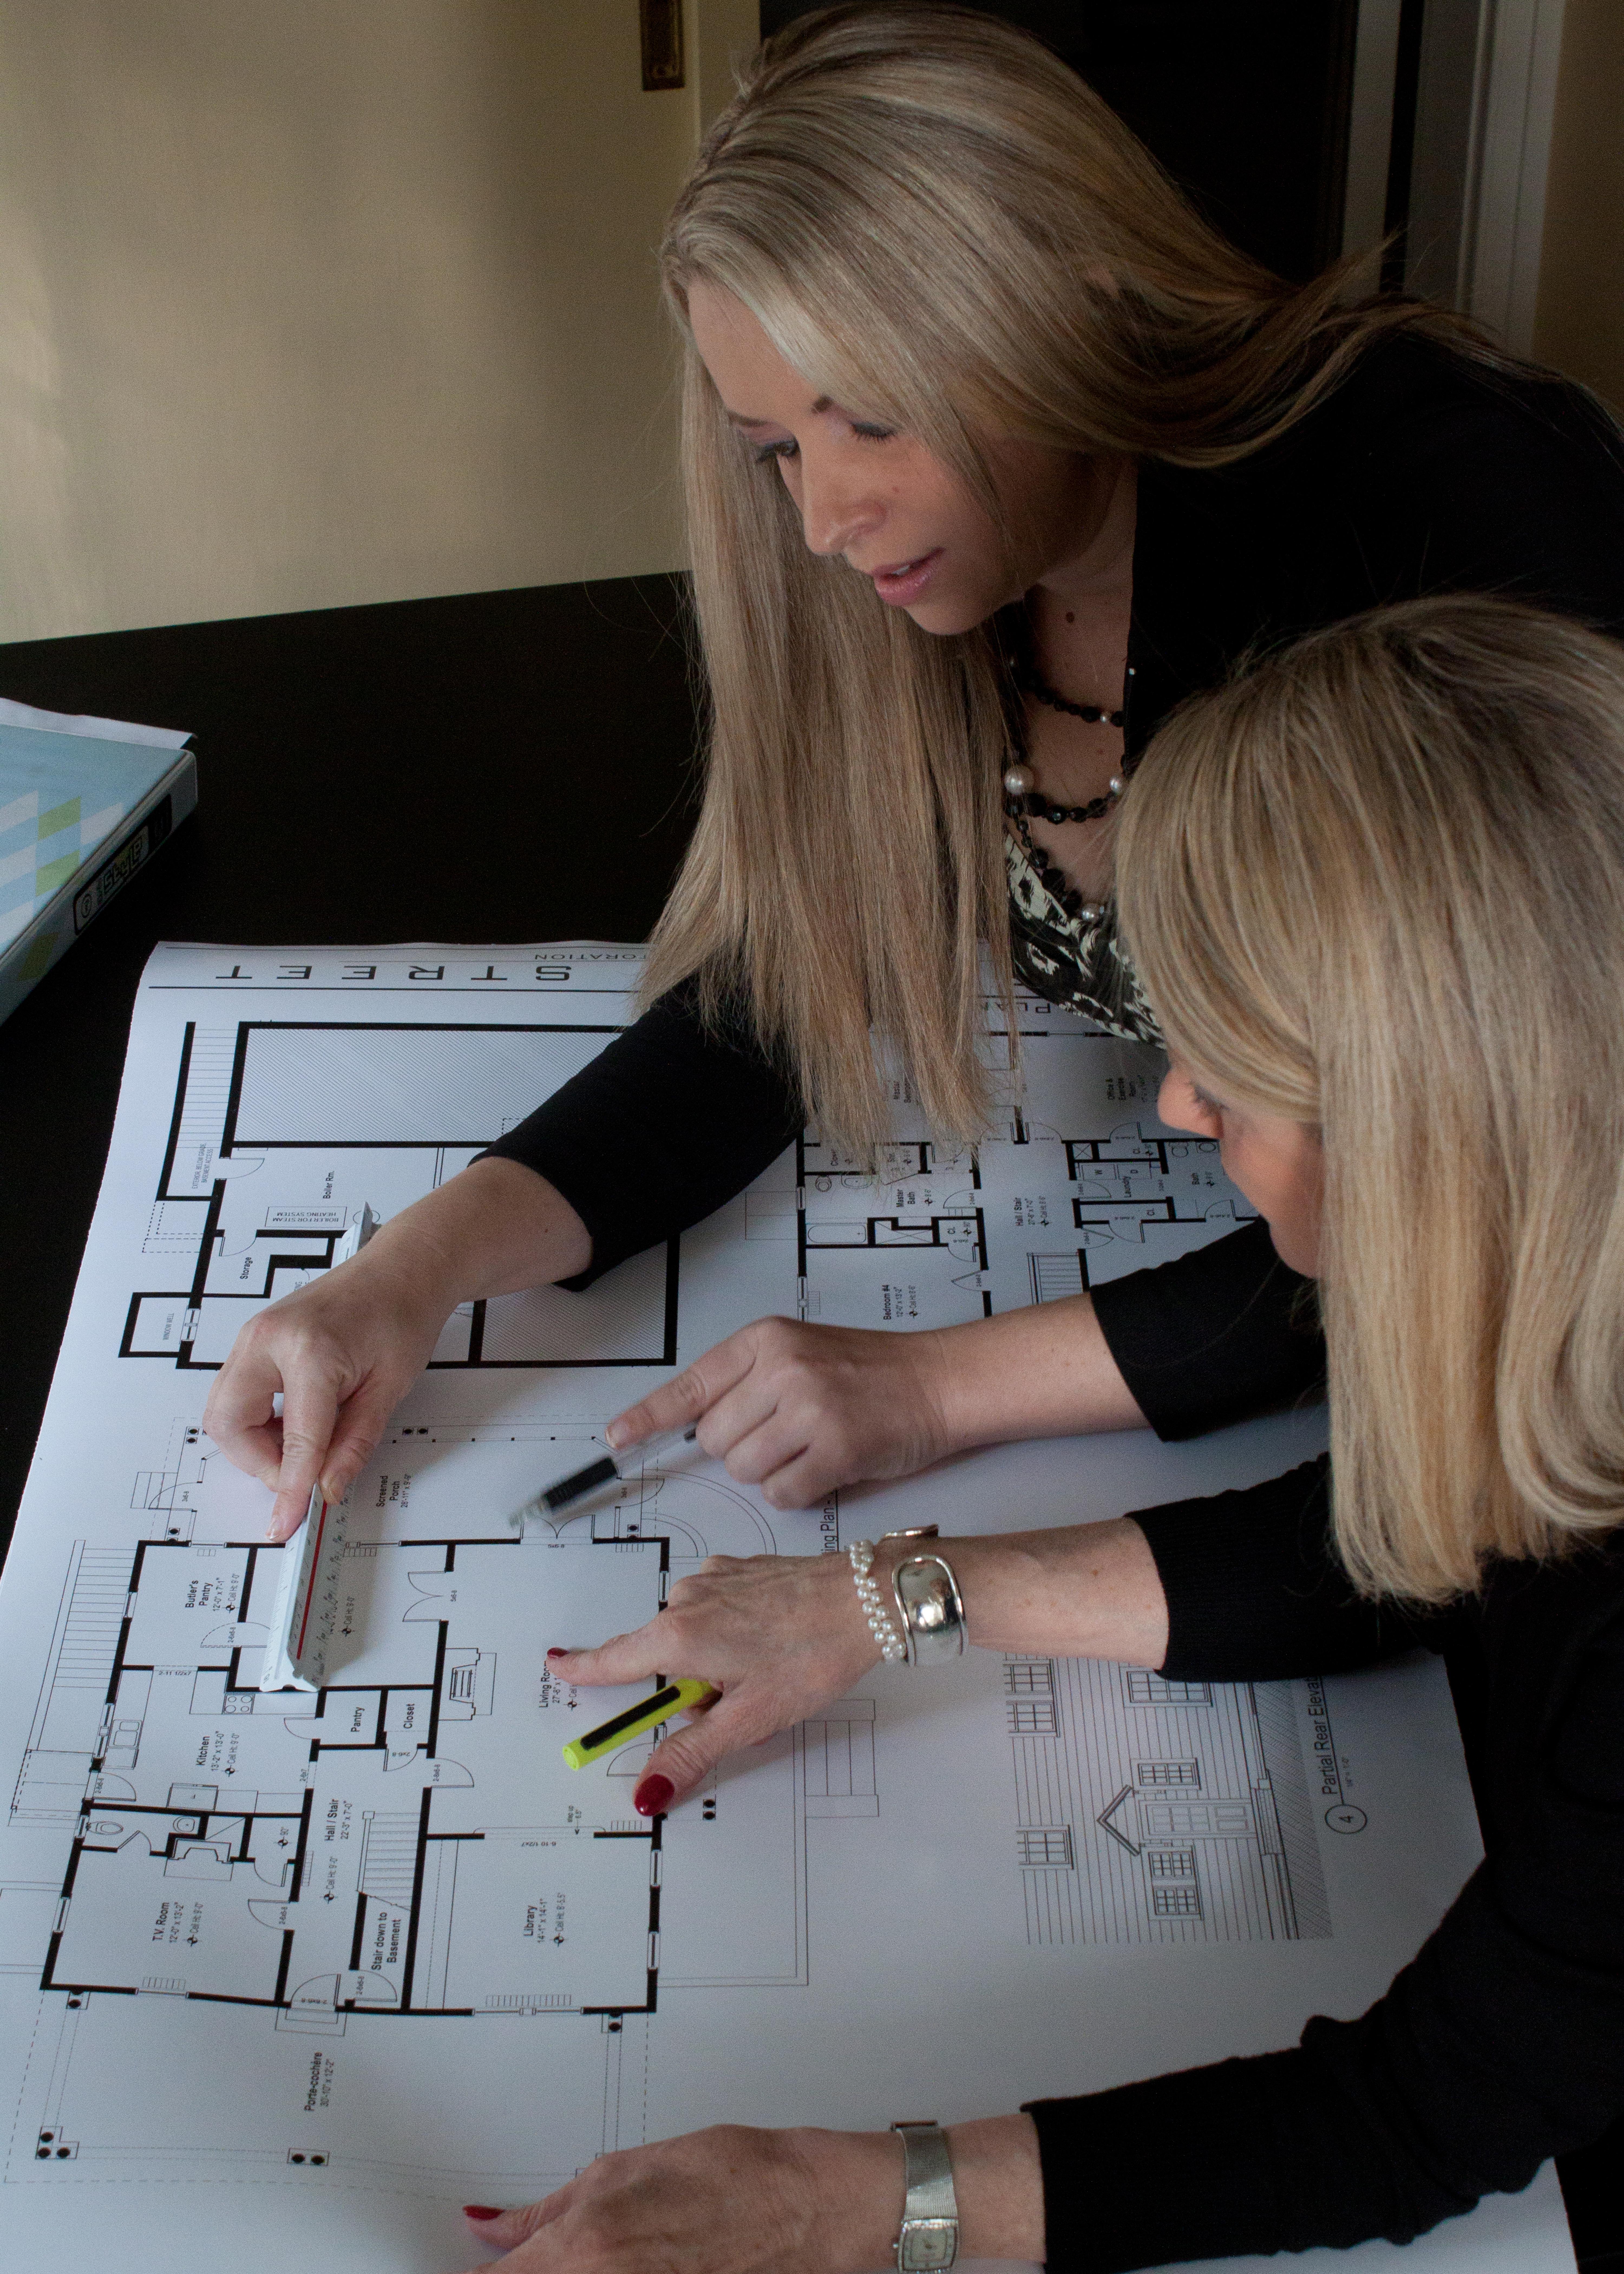 Top Greensboro Interior Designers Mary Elizabeth Beal And Madge Megliola